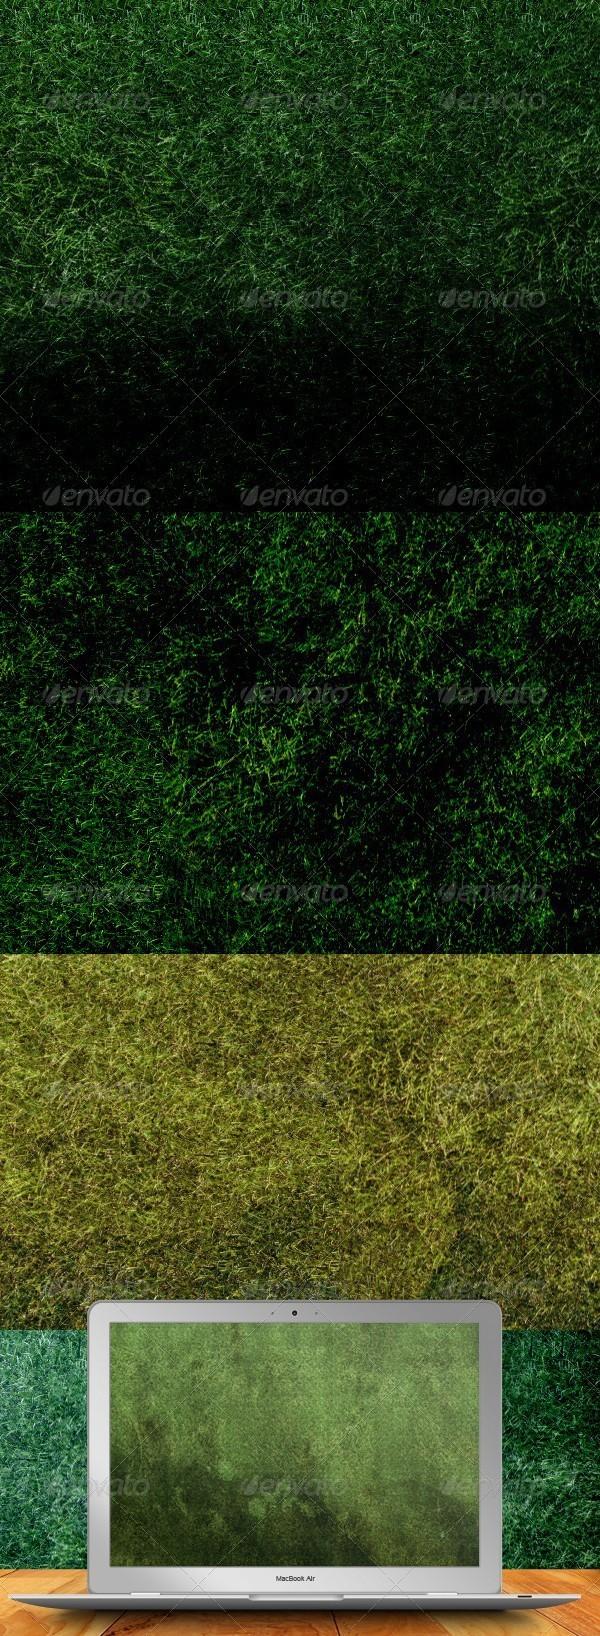 Grunge Grass Textures - Nature Textures